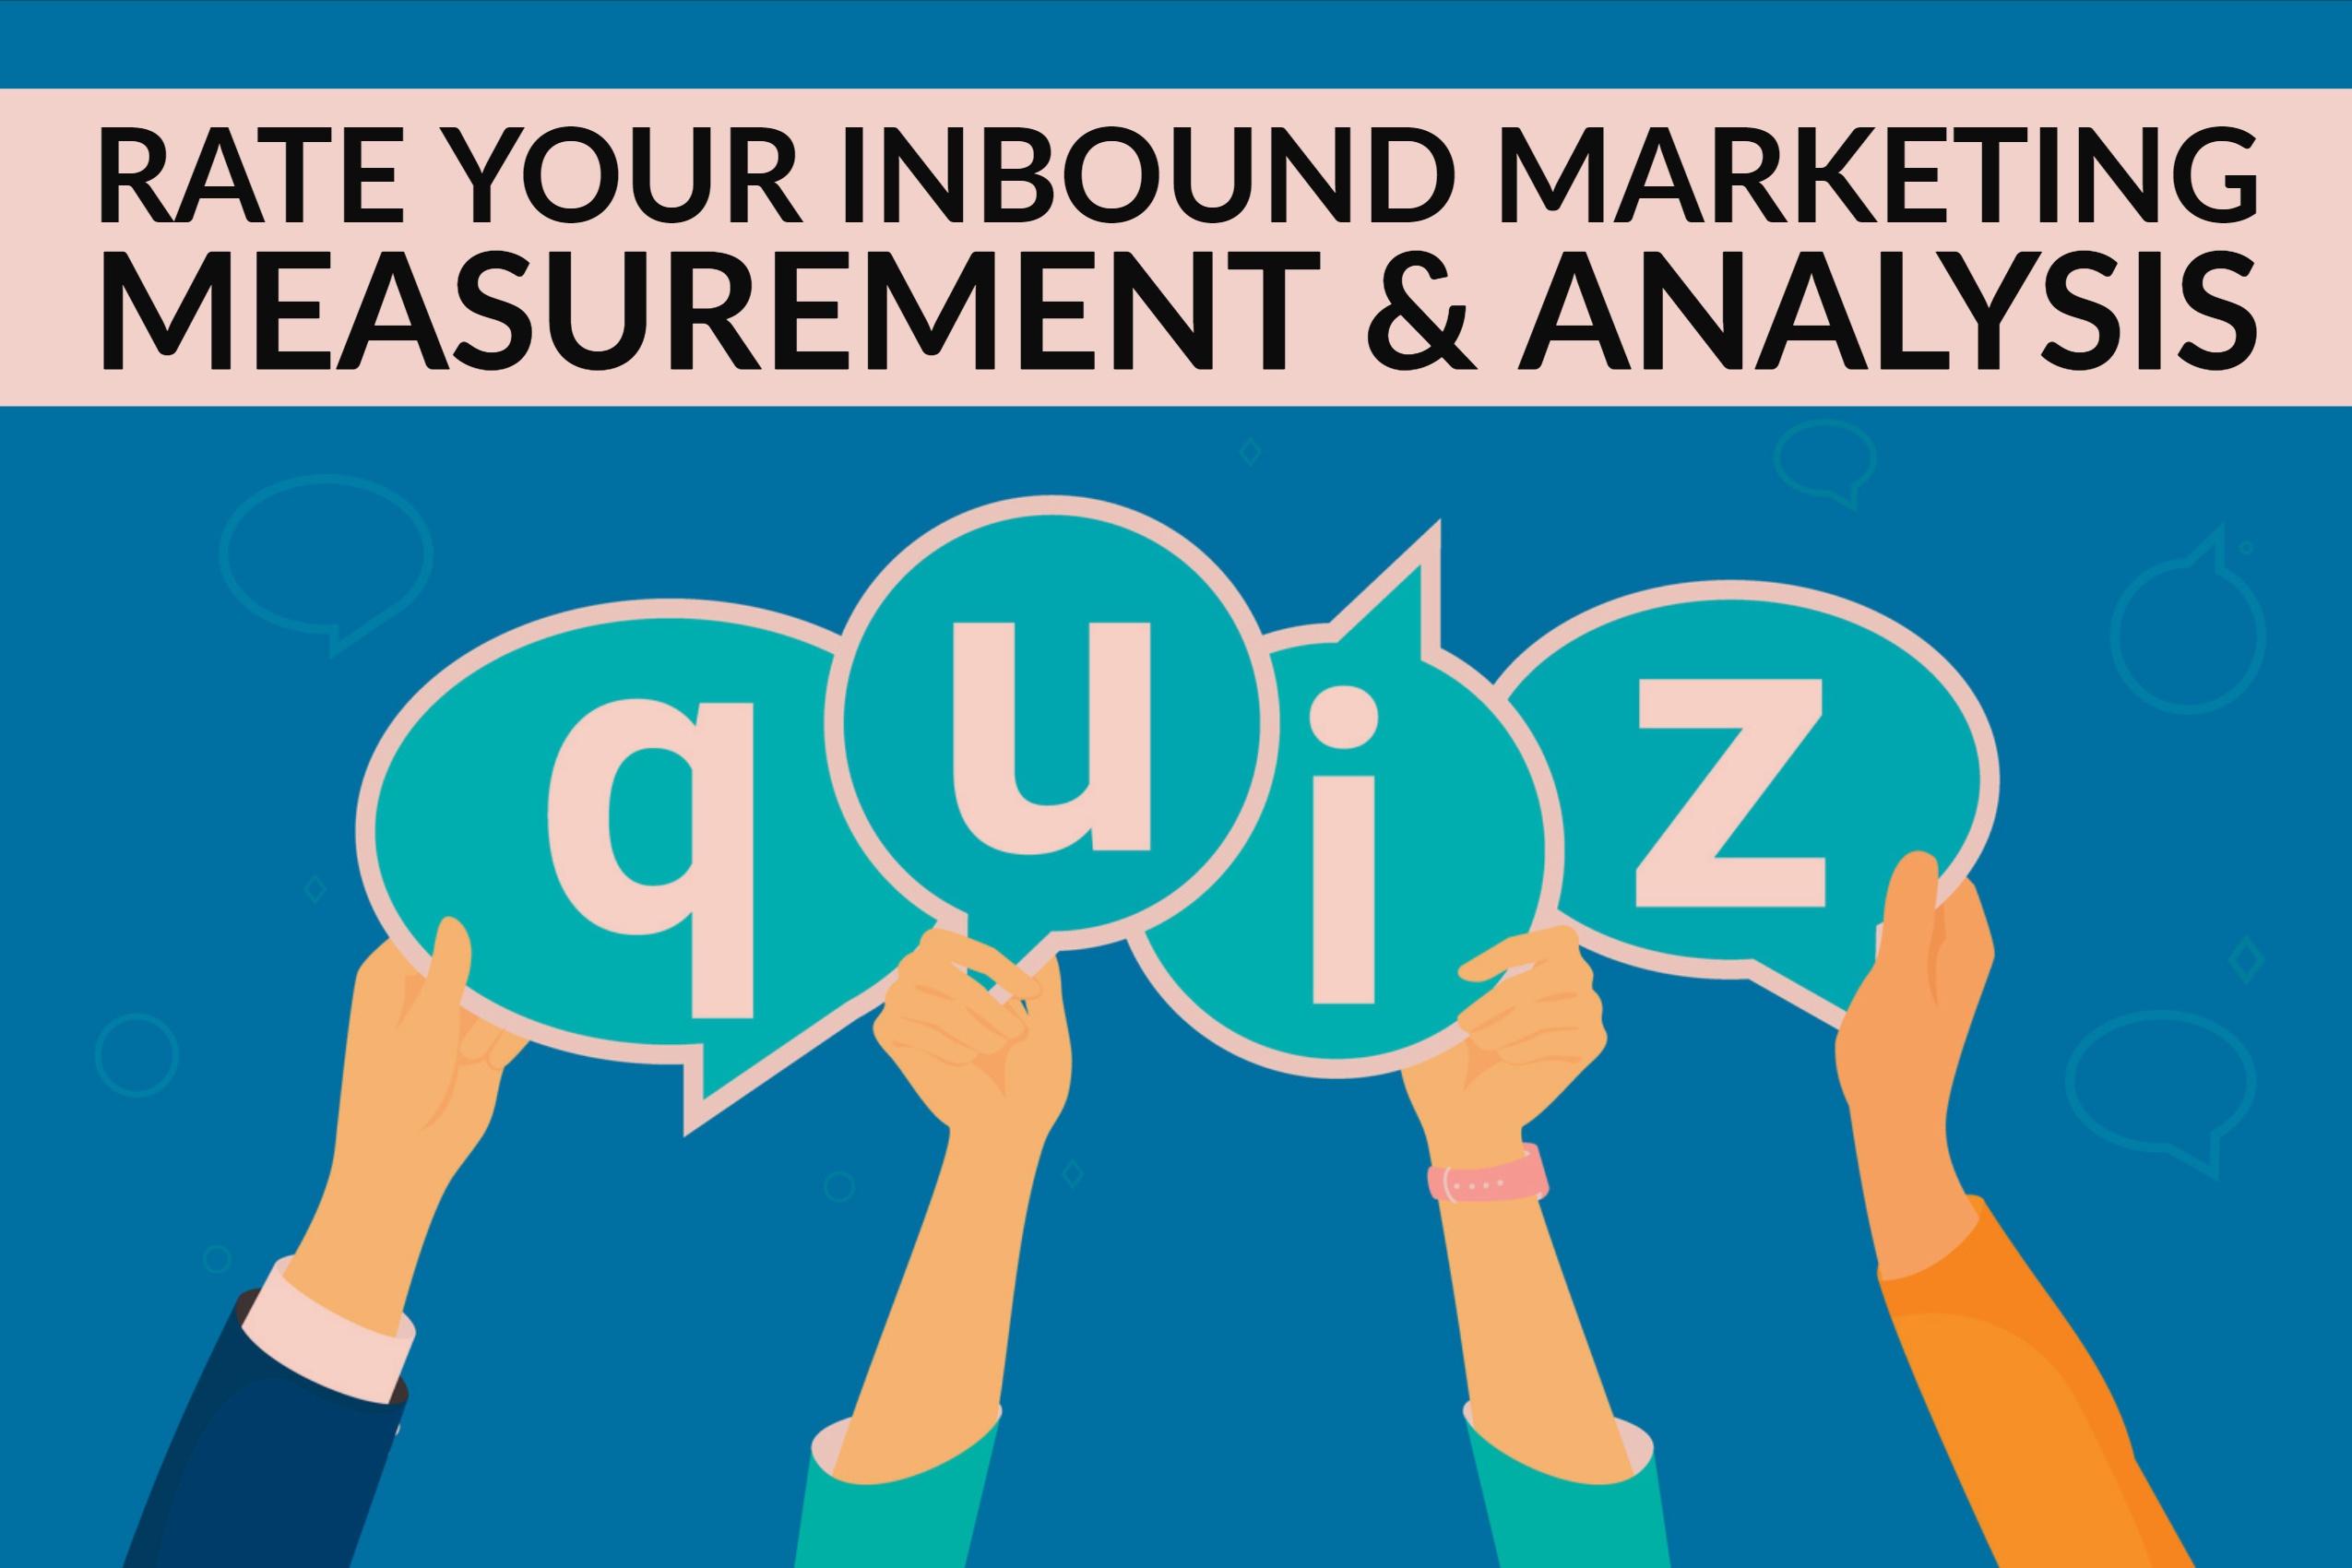 Rate Your Inbound Marketing Measurement & Analysis (quiz) (1)